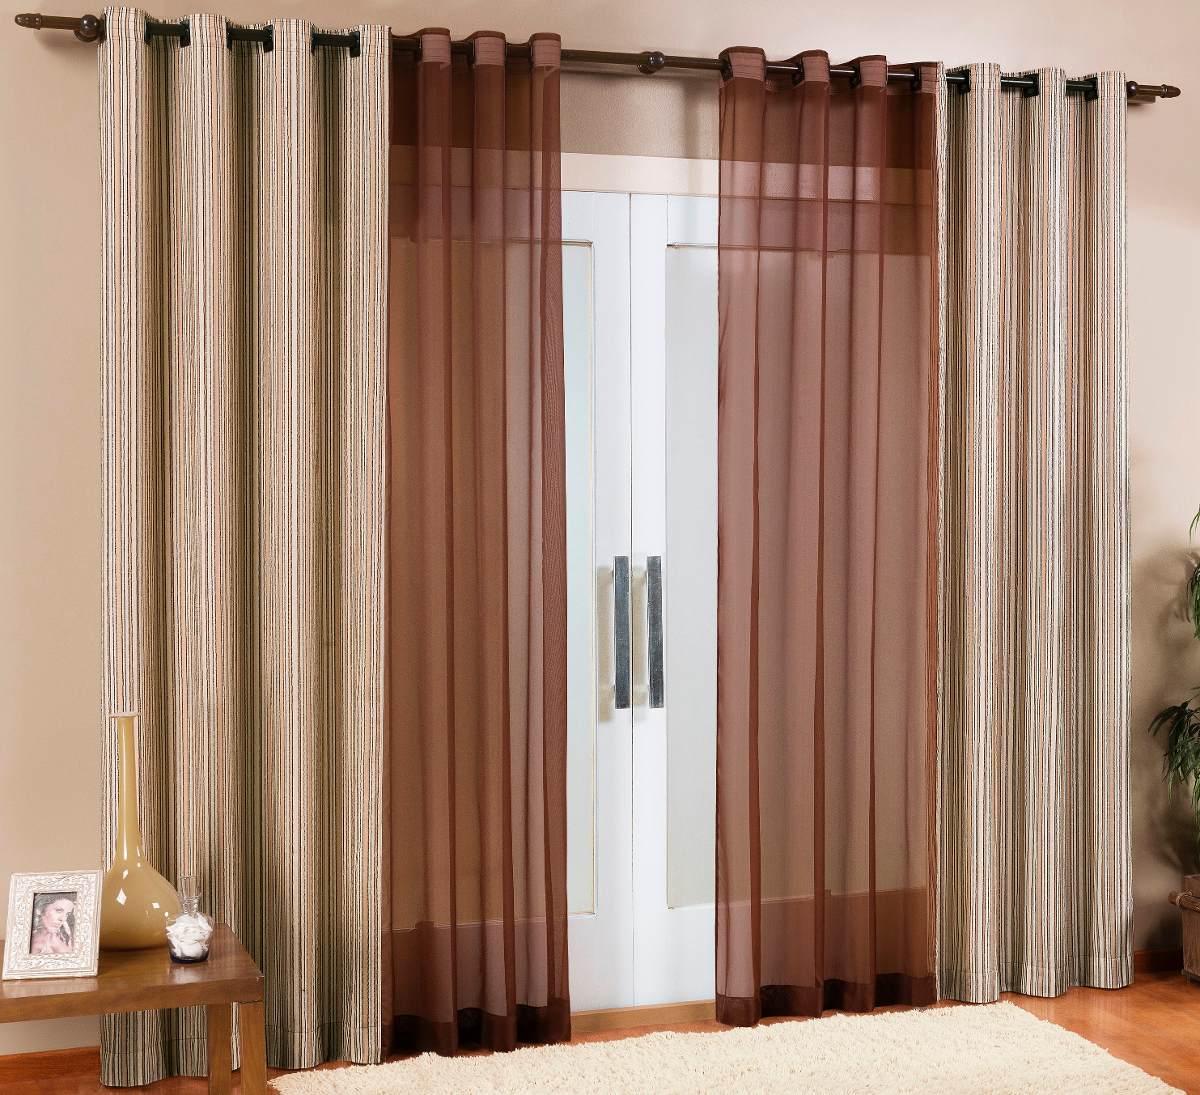 Cortinas sala varao tecido rustico 3 00 x 2 80 tecido e - Cortinas de decoracion ...